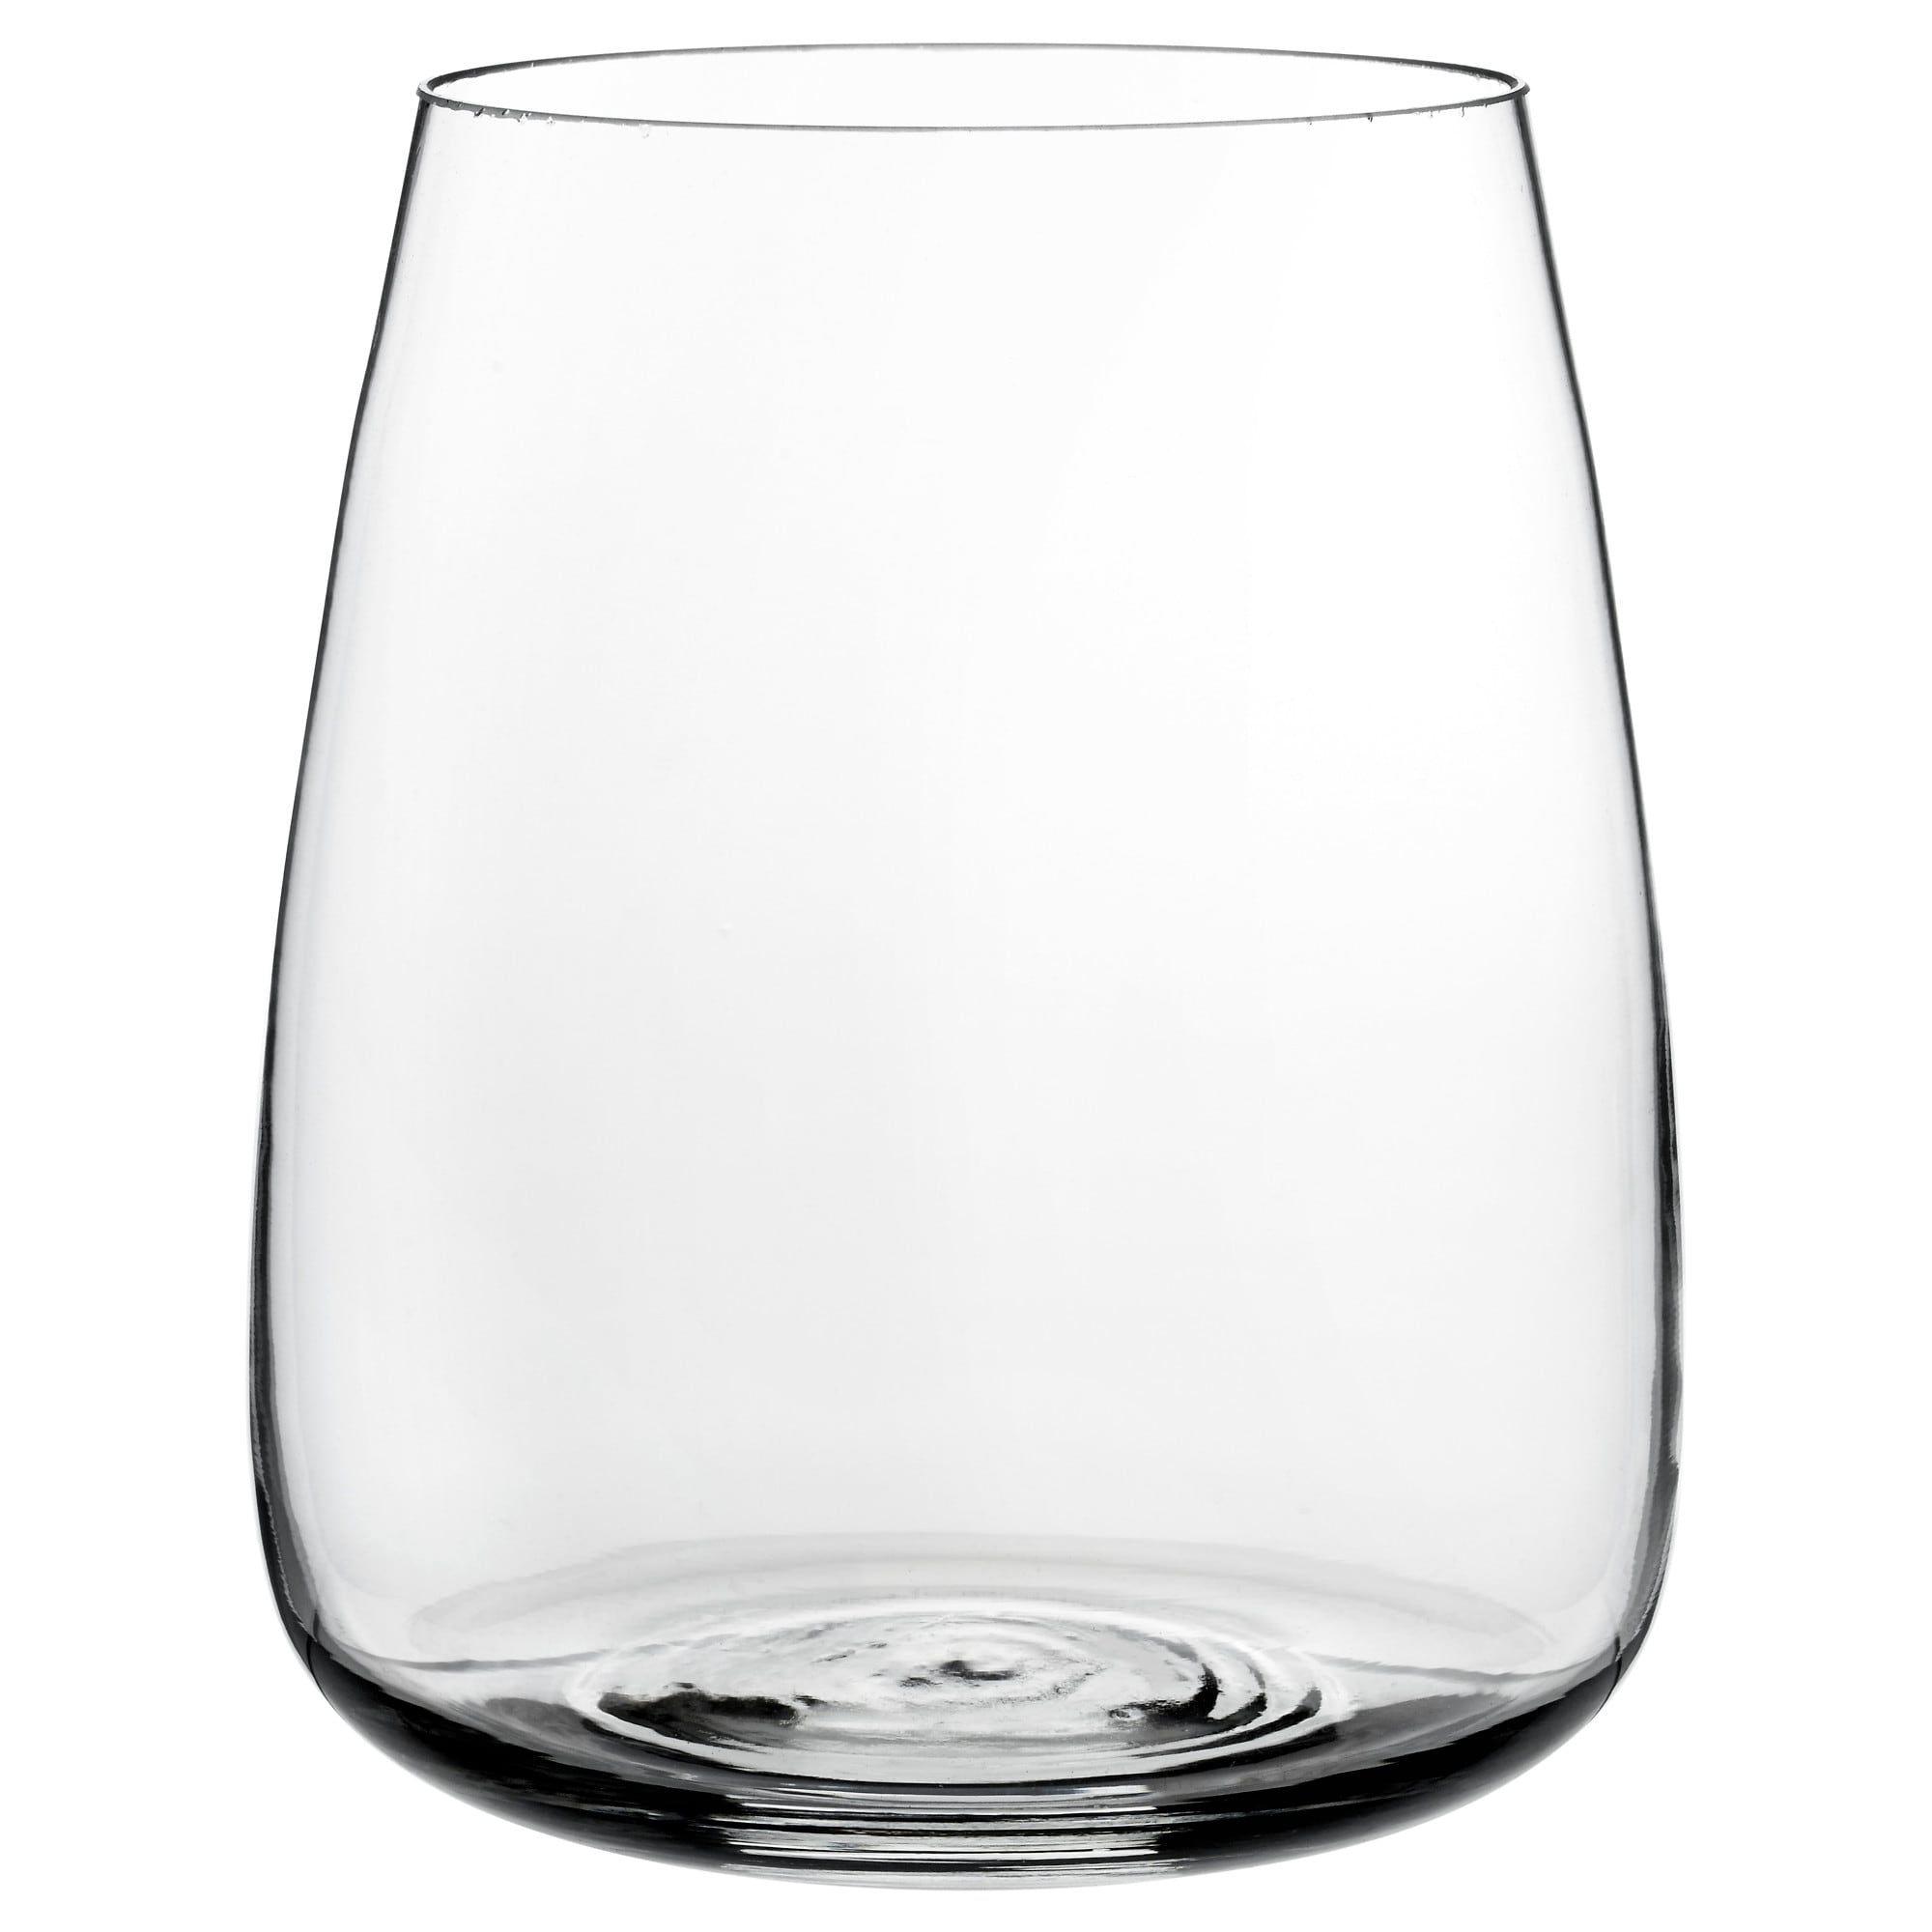 Berakna Vase Clear Glass 7 Ikea Vases Vase Clear Glass Vases